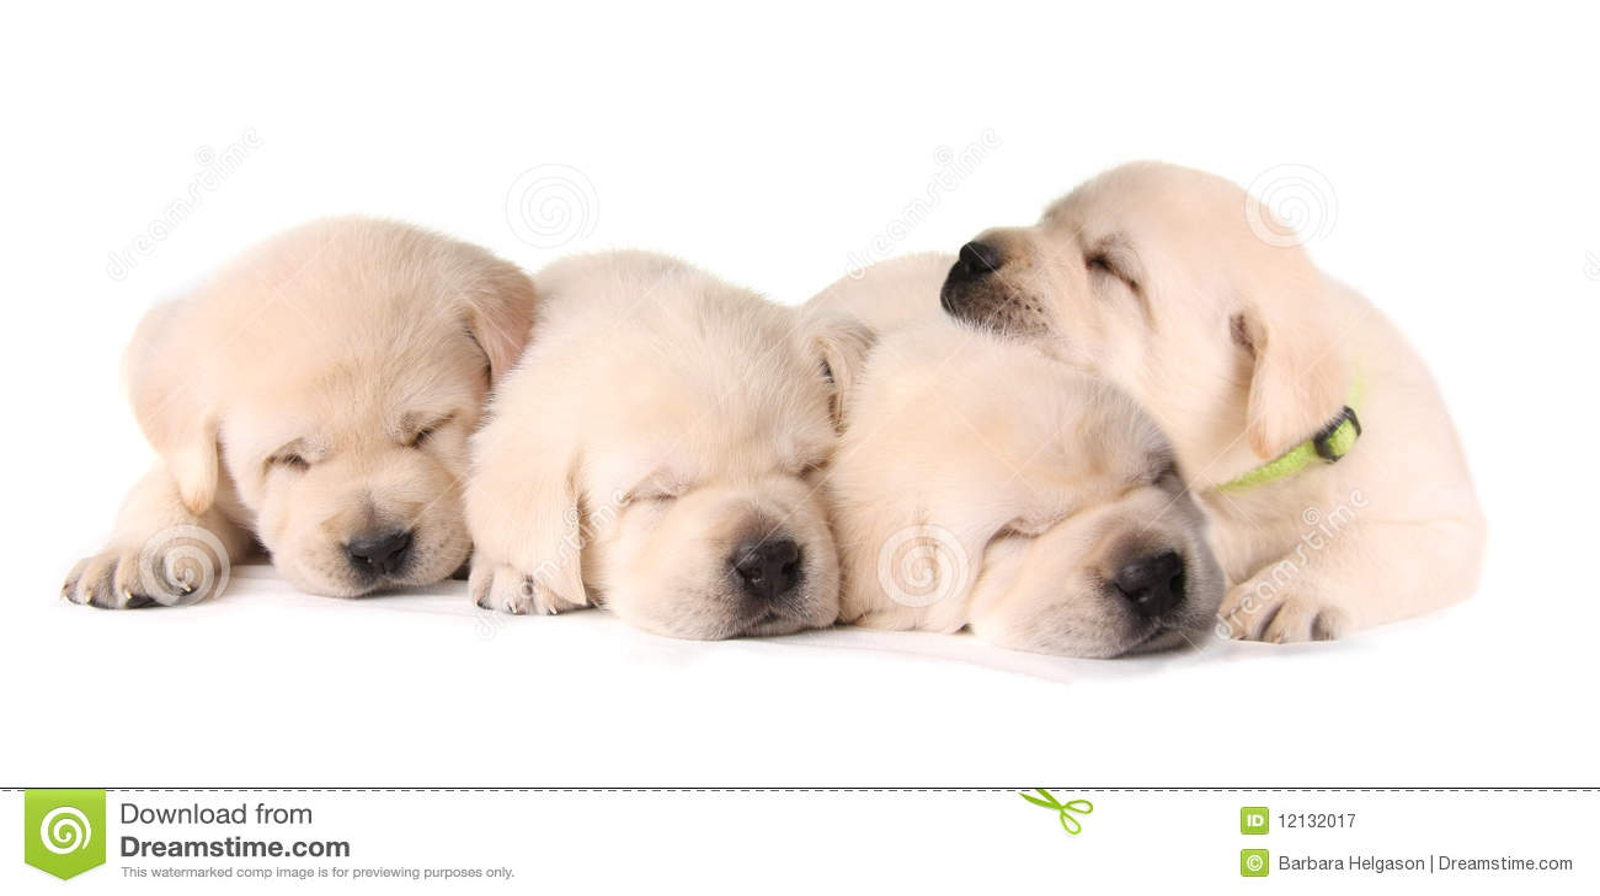 Four sleeping puppies